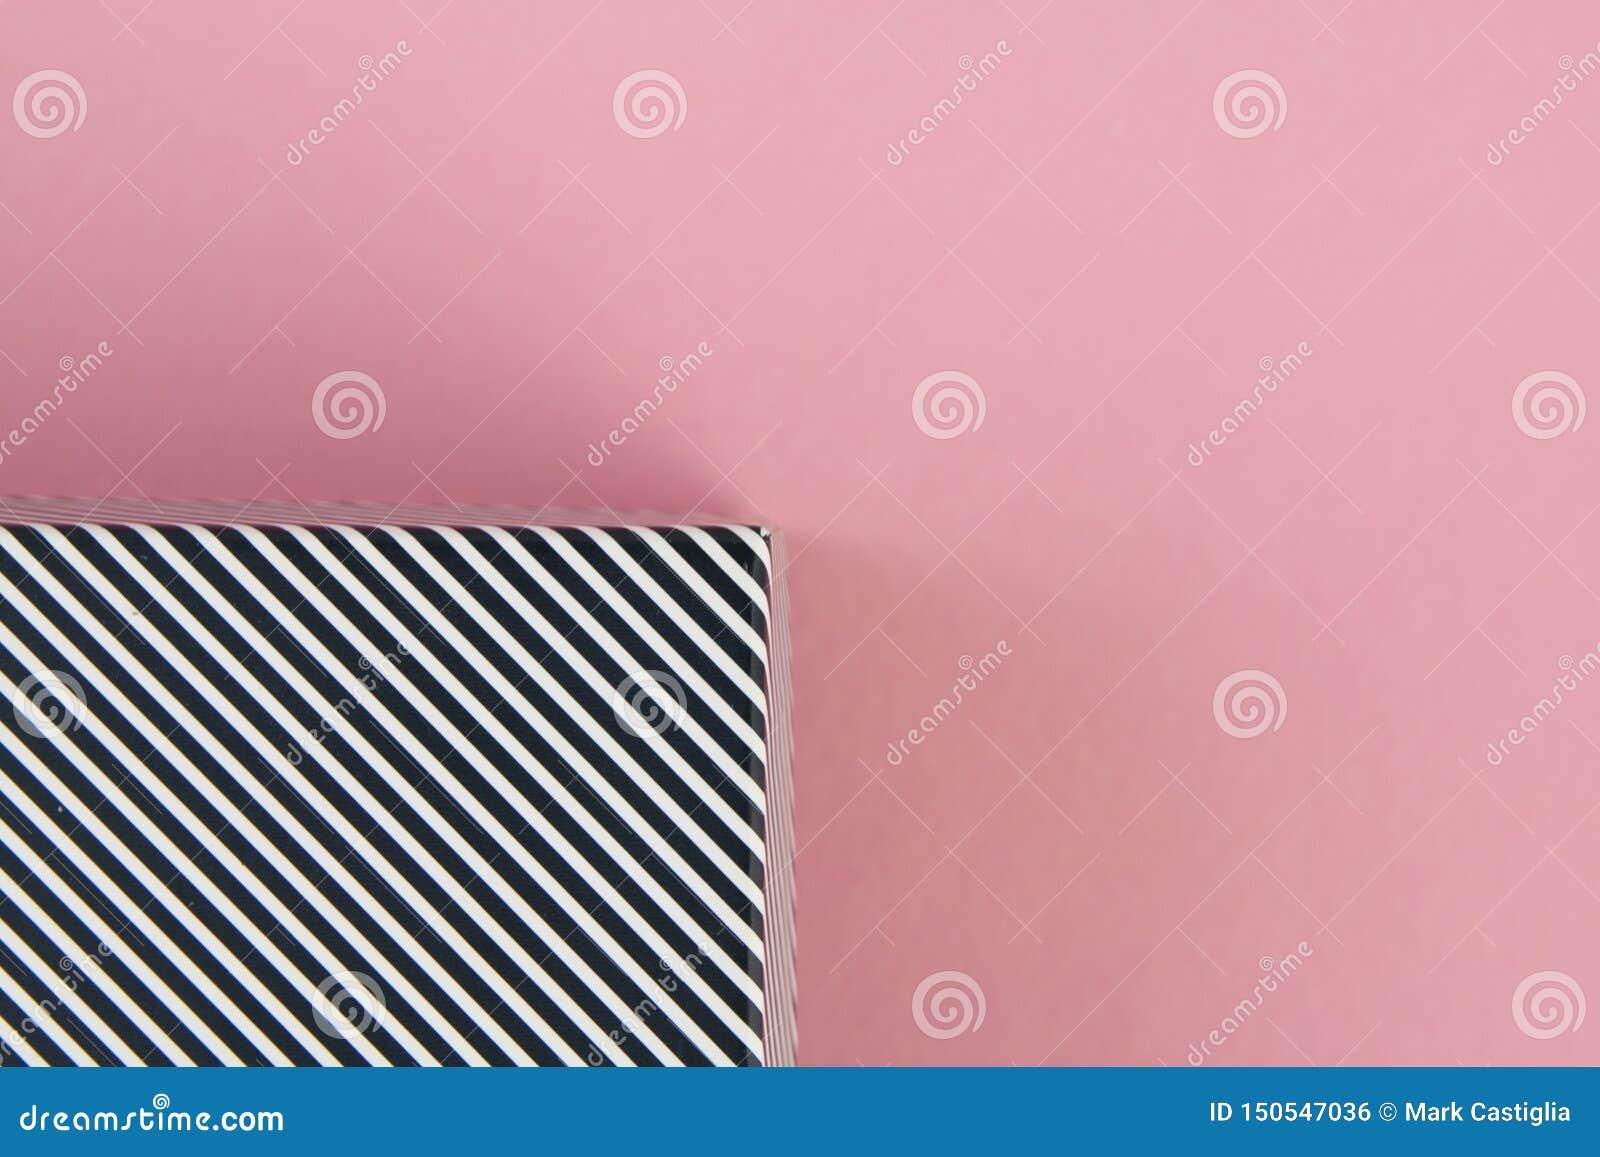 Listras preto e branco diagonais no fundo cor-de-rosa pastel